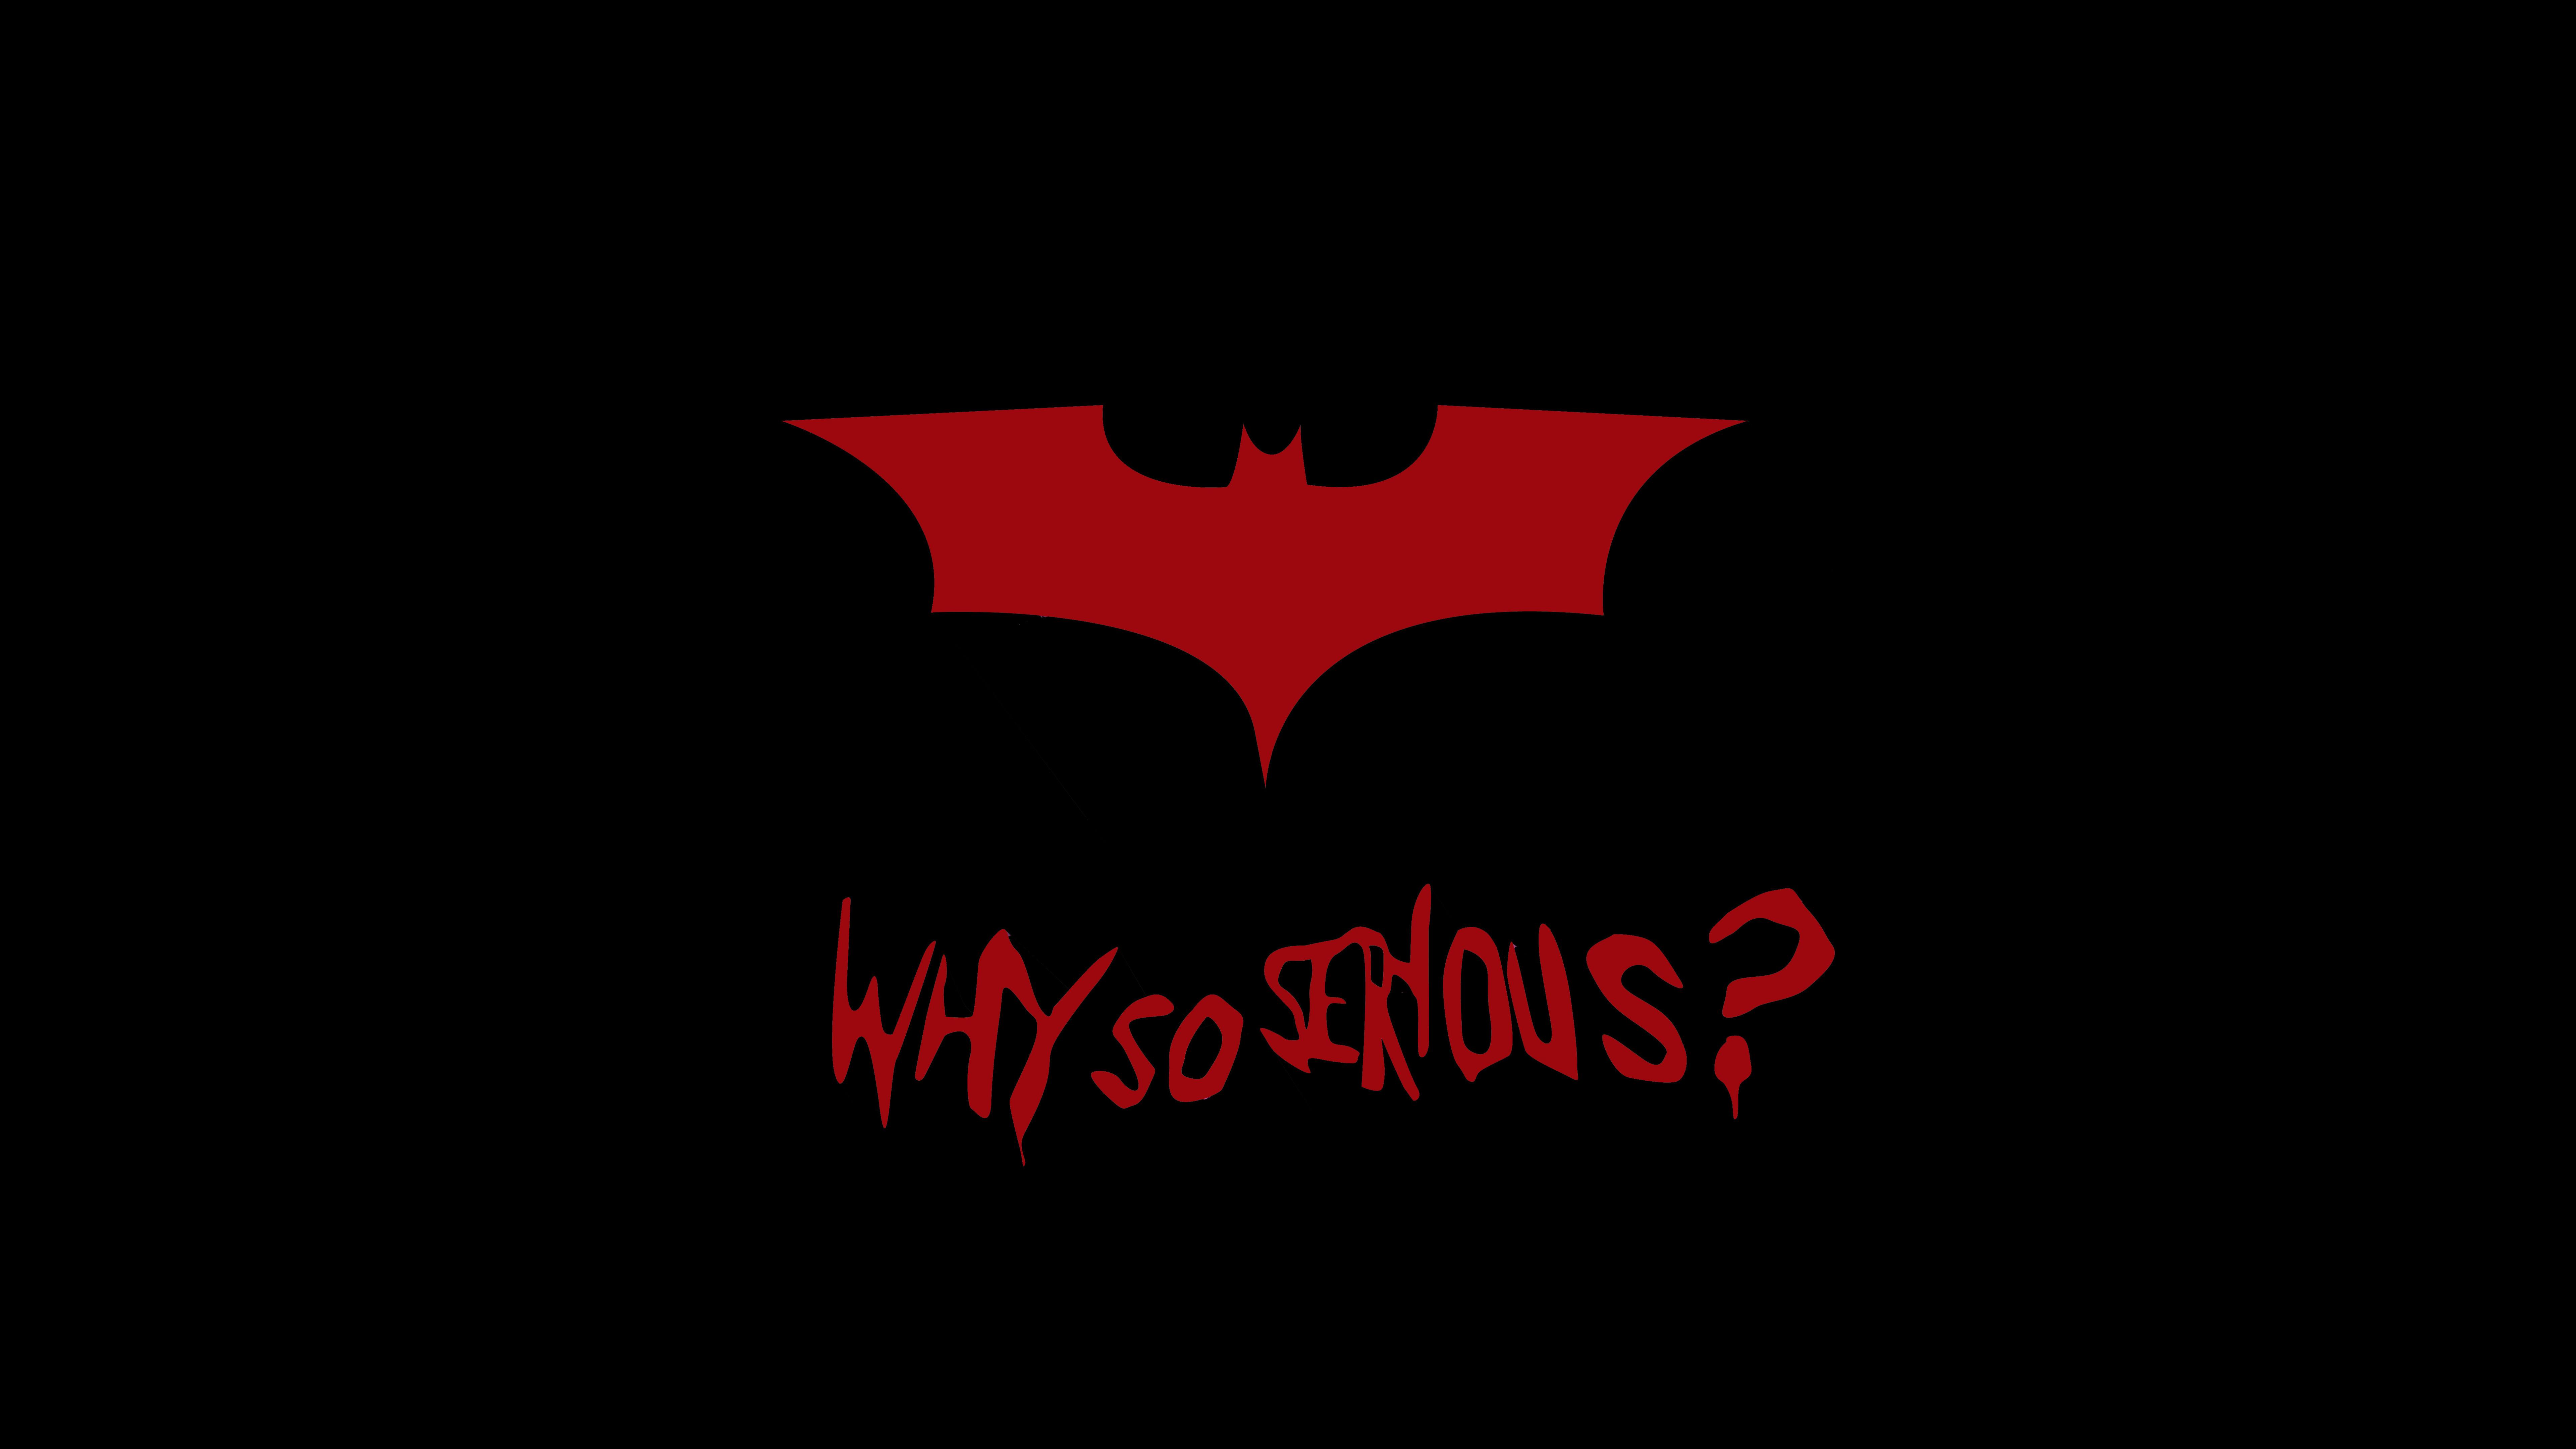 7680x4320 Batman Logo 8k 8k Hd 4k Wallpapers Images